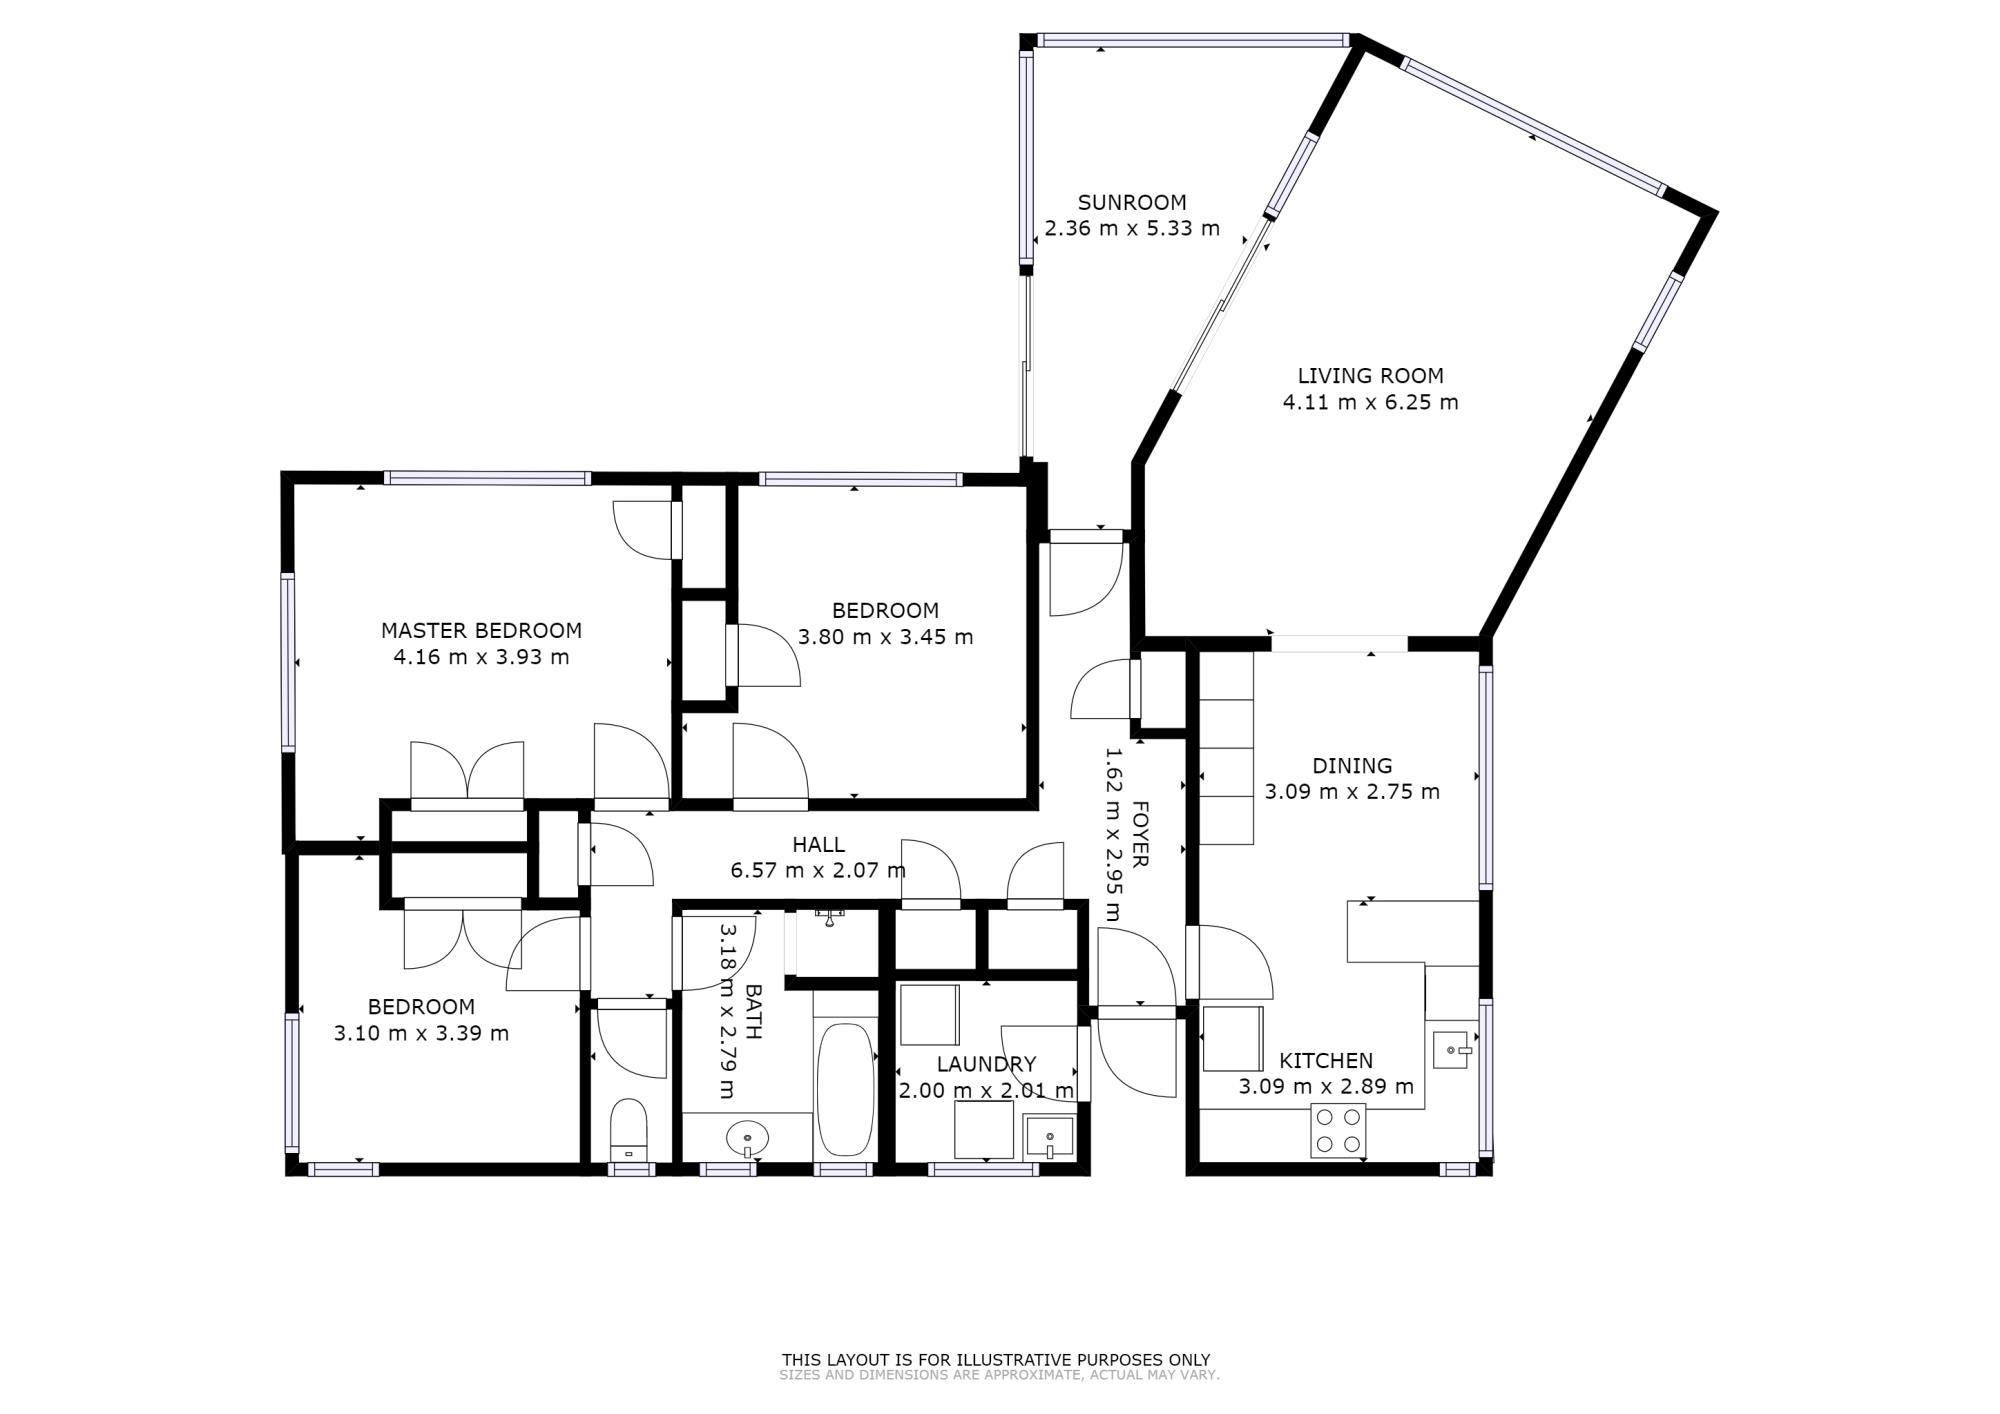 5 Hinemoa Street Onerahiproperty floorplan image